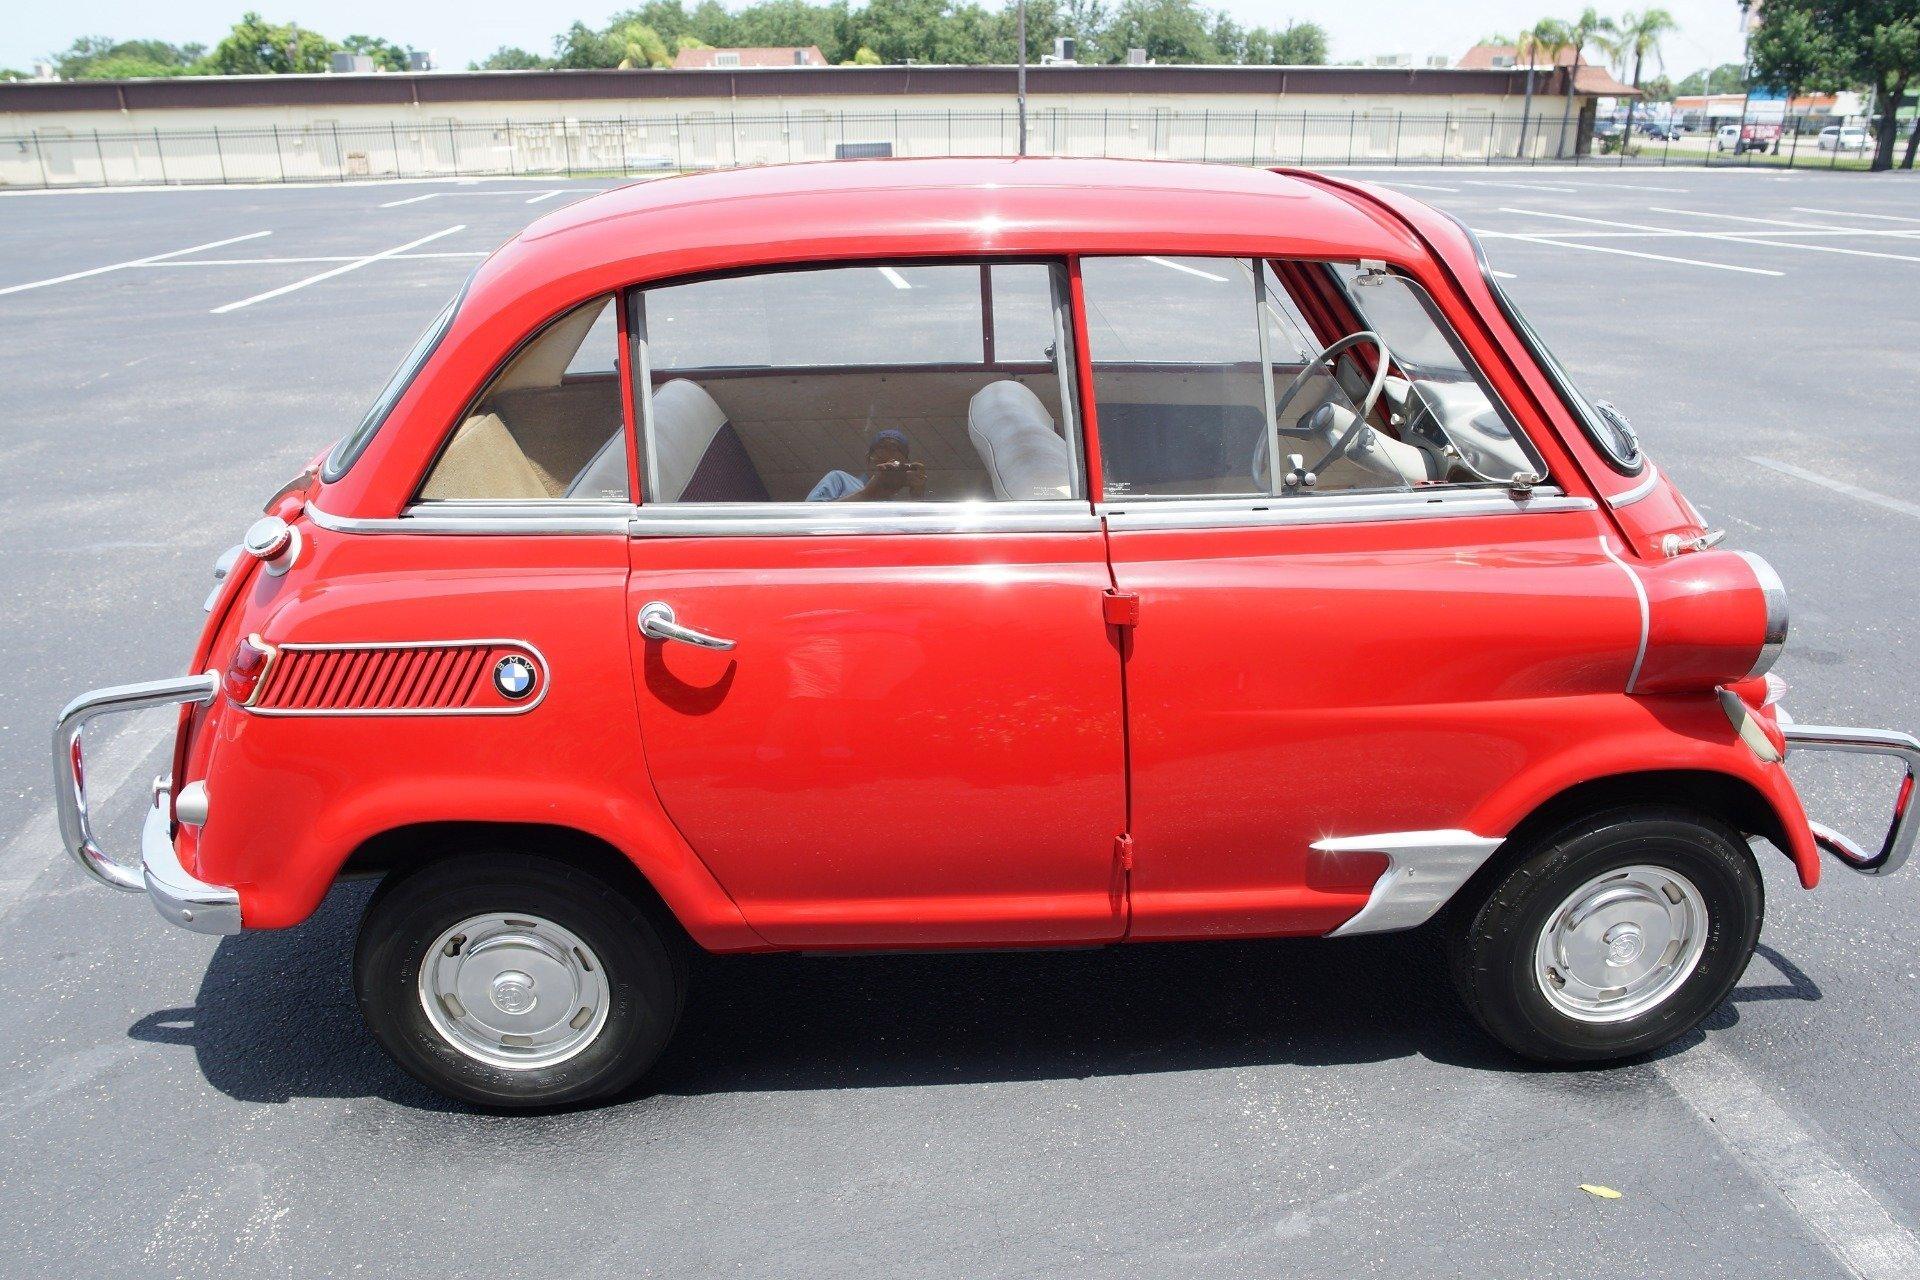 1959 Bmw Isetta 600 For Sale 92641 Mcg